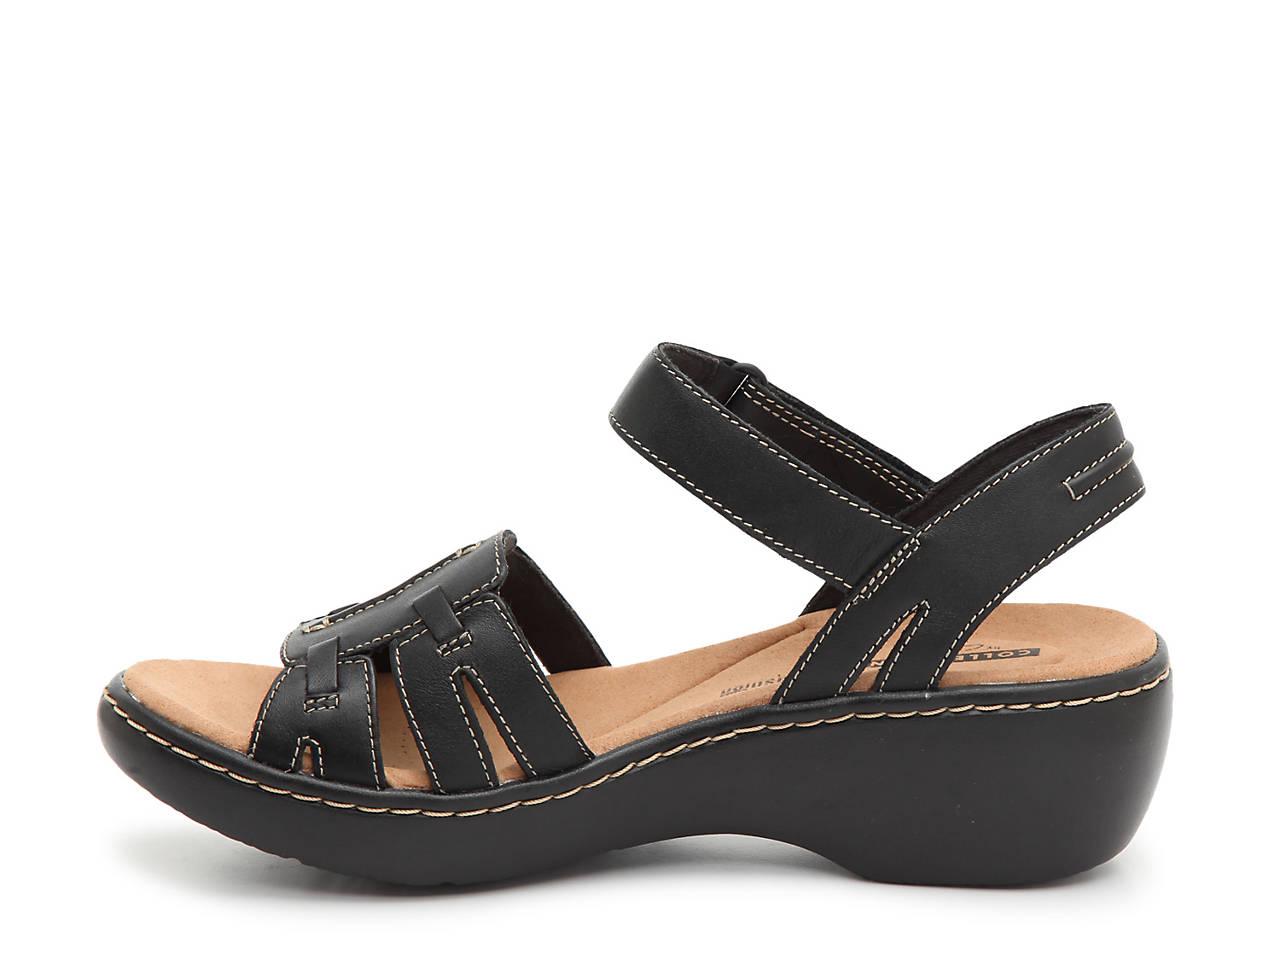 ac0d12c5bd6 Clarks Delana Nila Wedge Sandal Women s Shoes